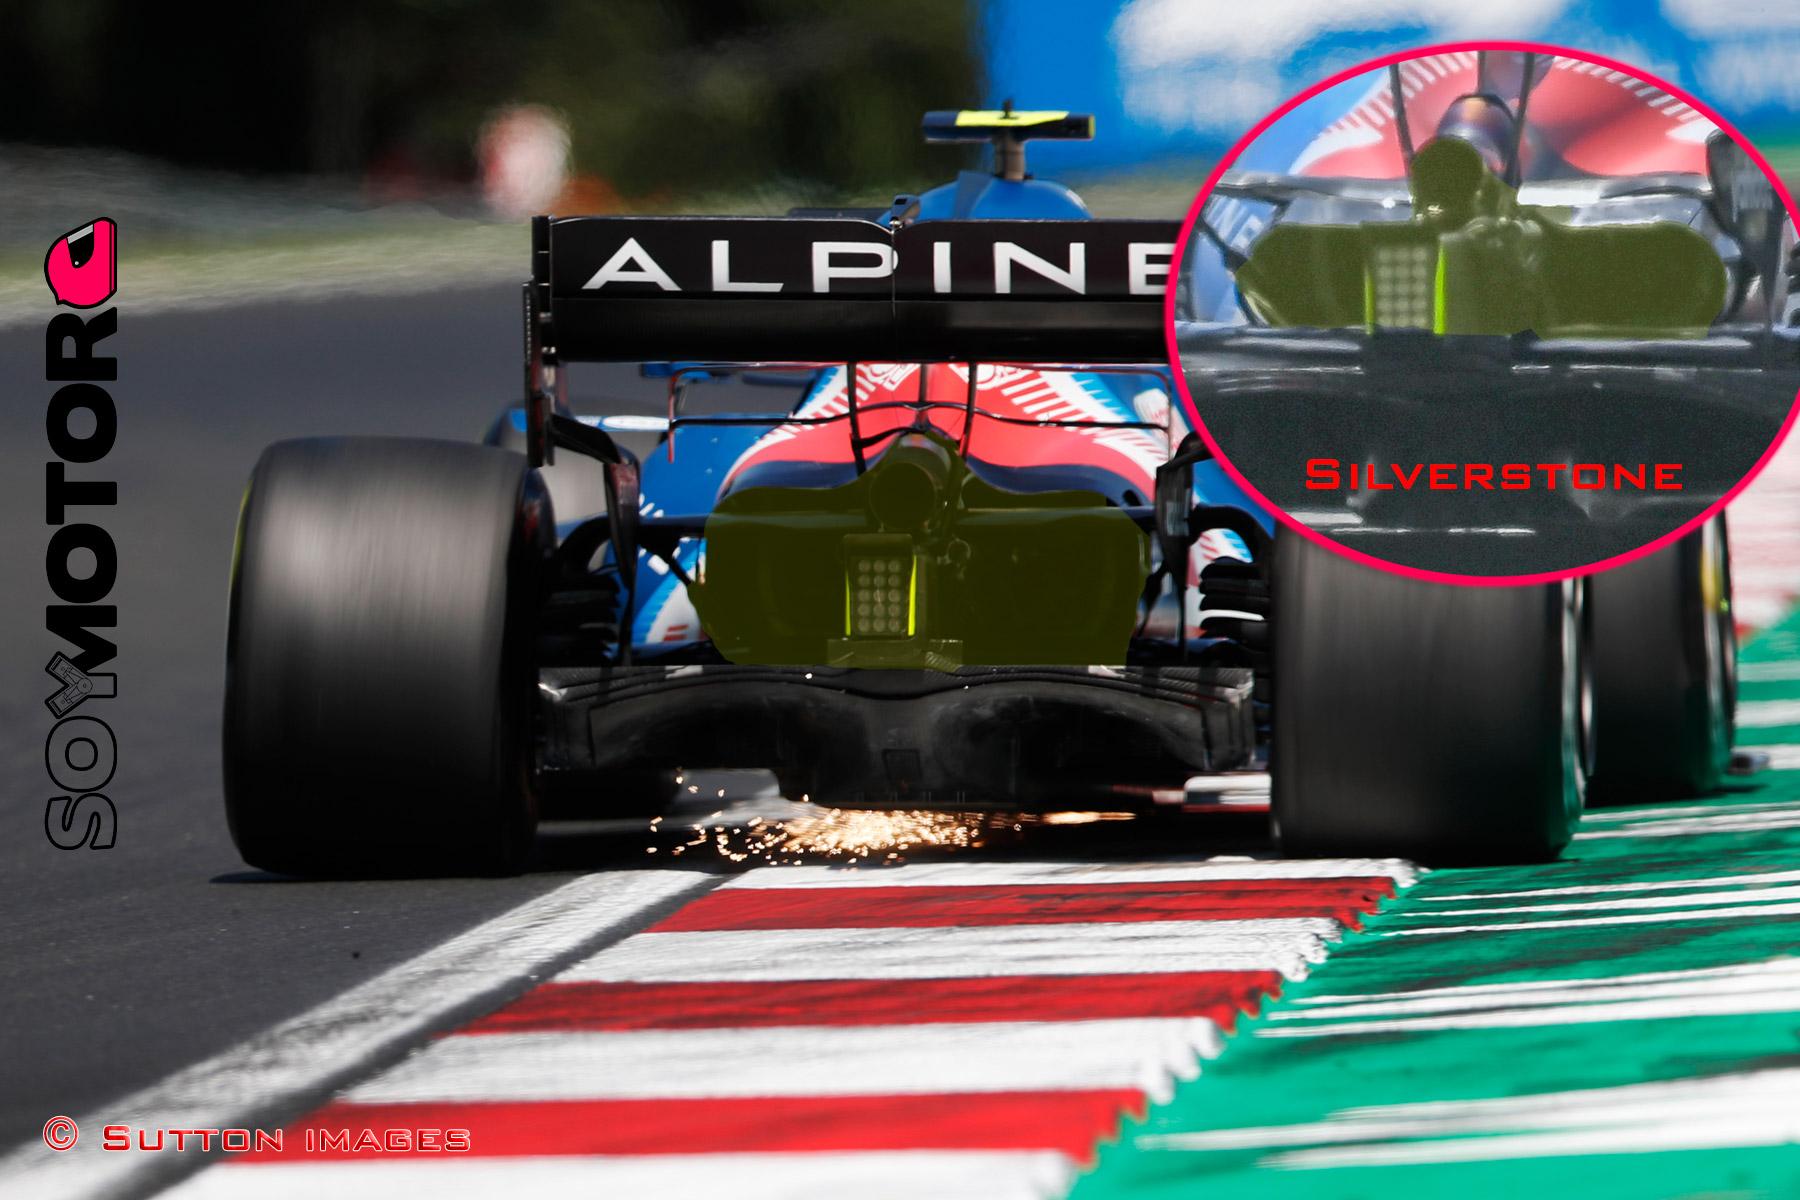 alpine-salida-posterior-soymotor_0.jpg